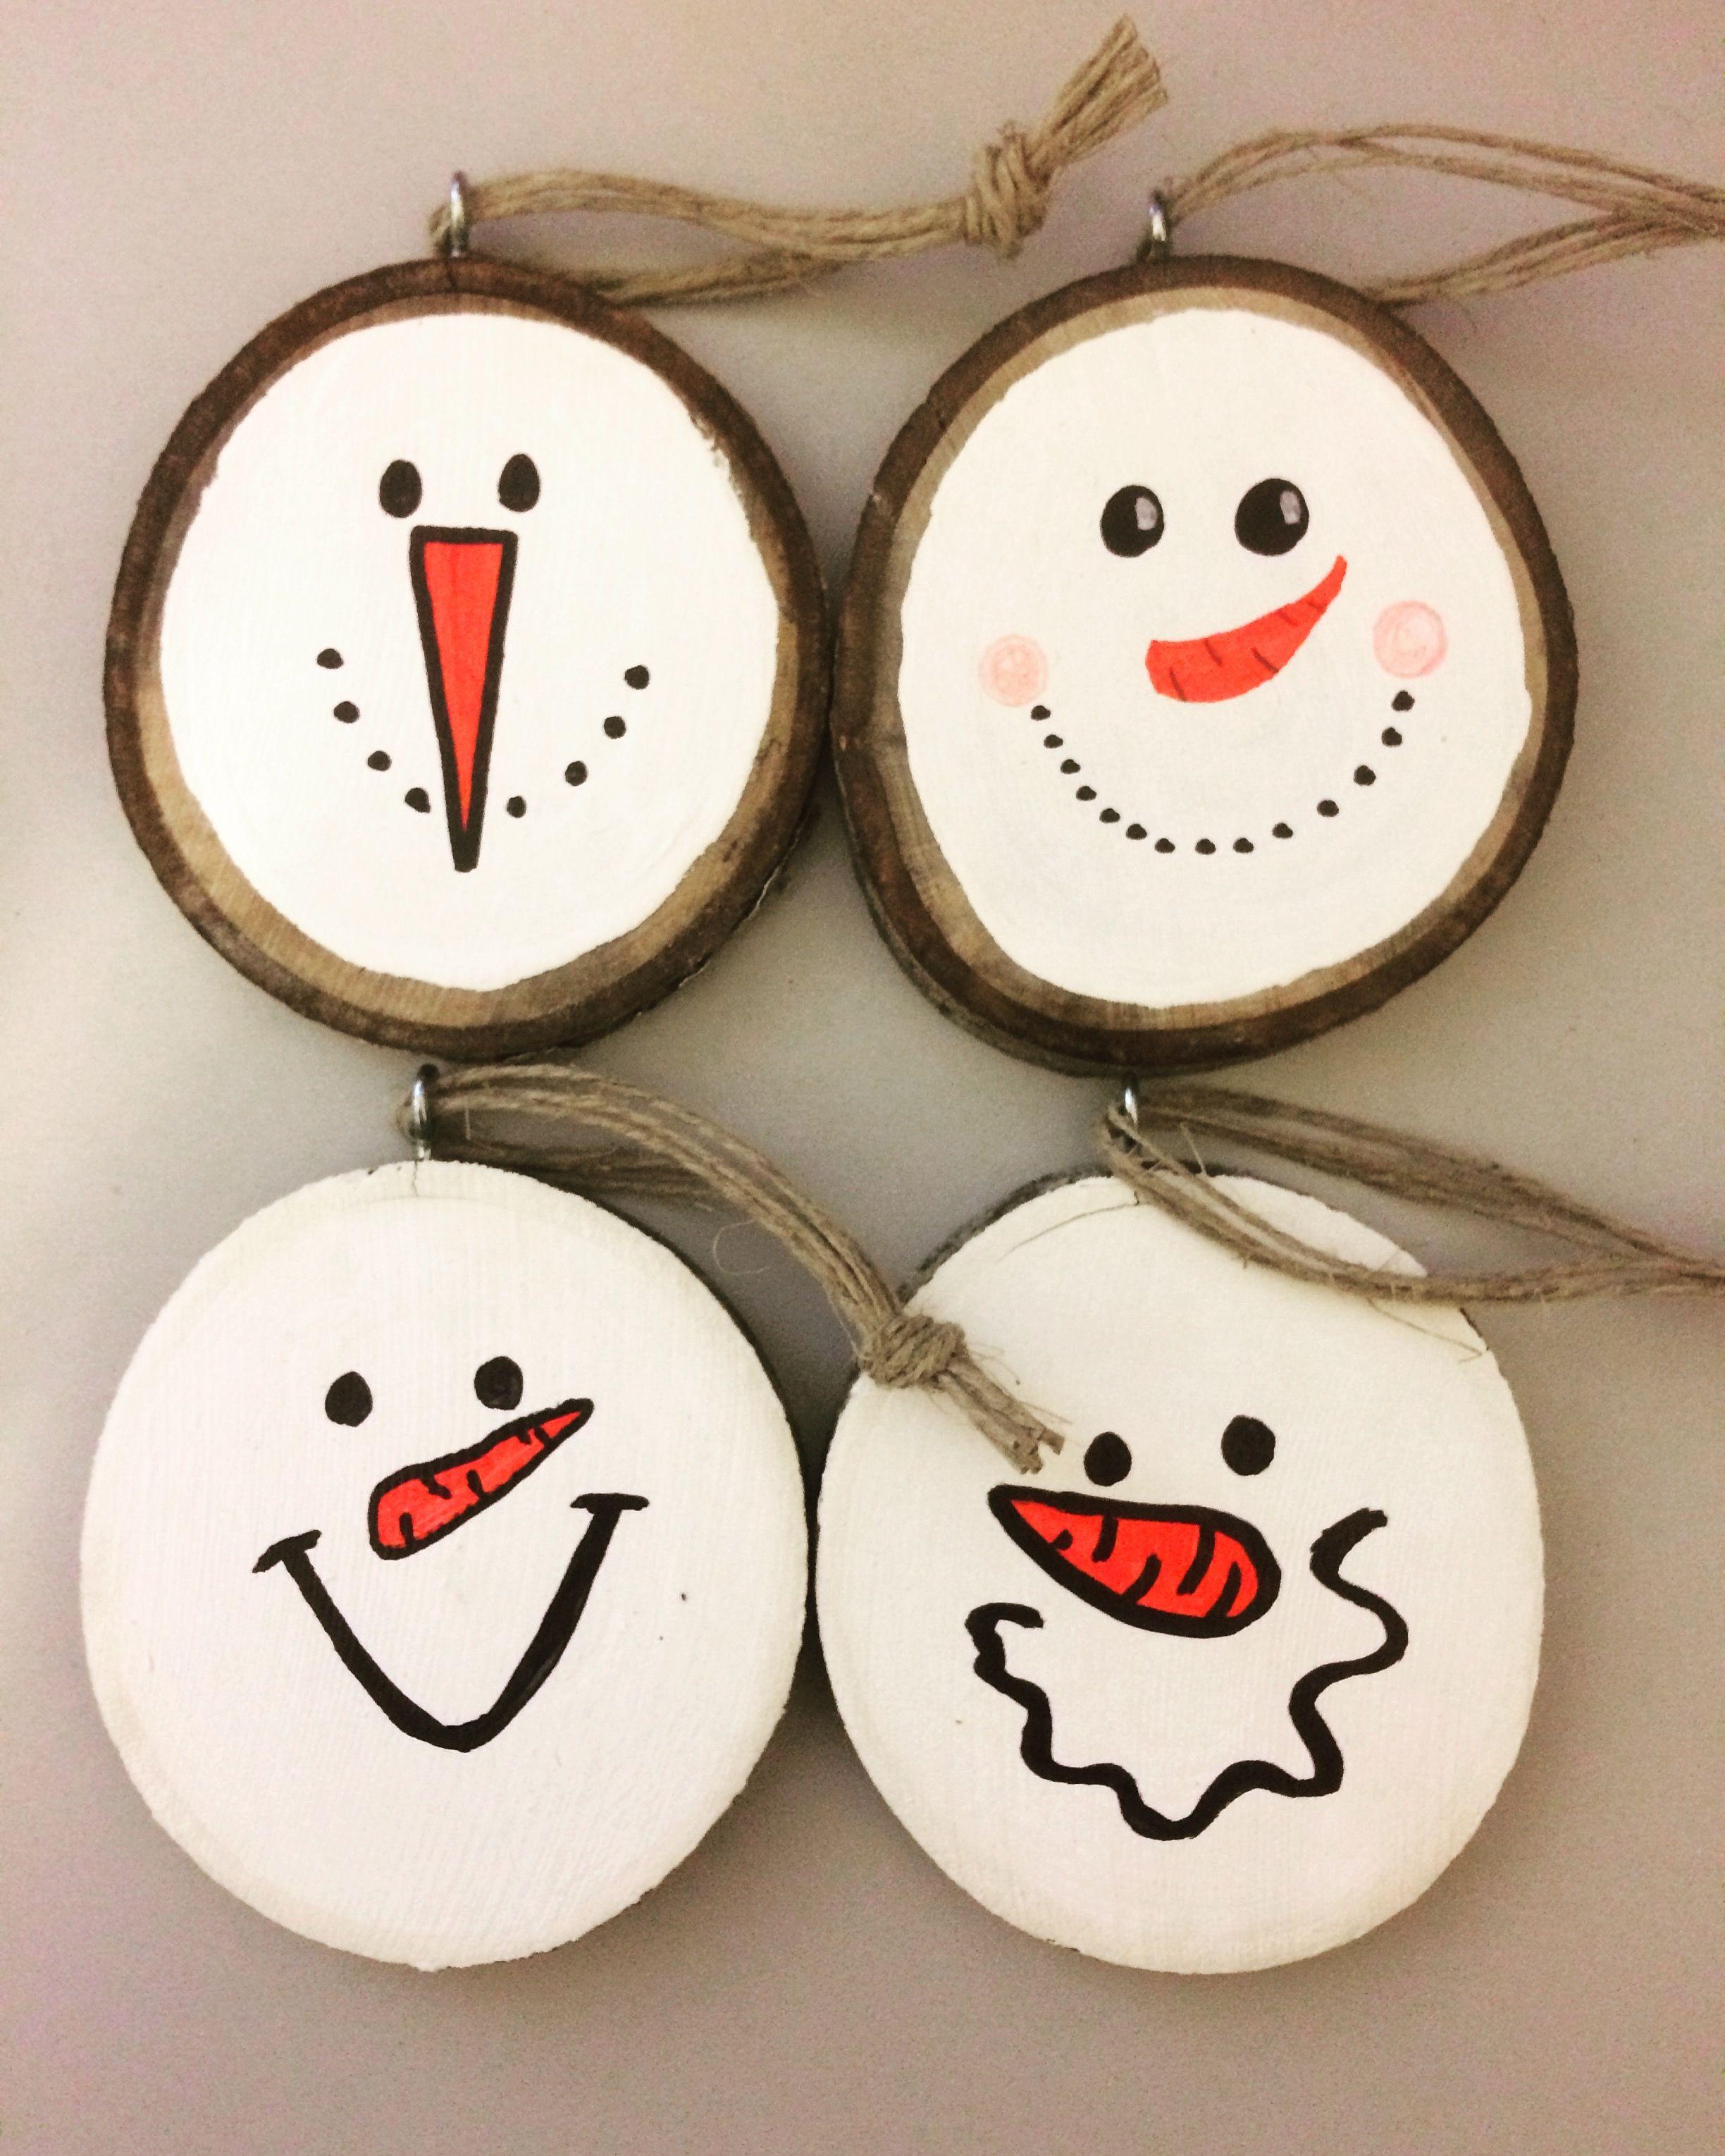 Snowman snowmen wood slices ornaments Christmas painting